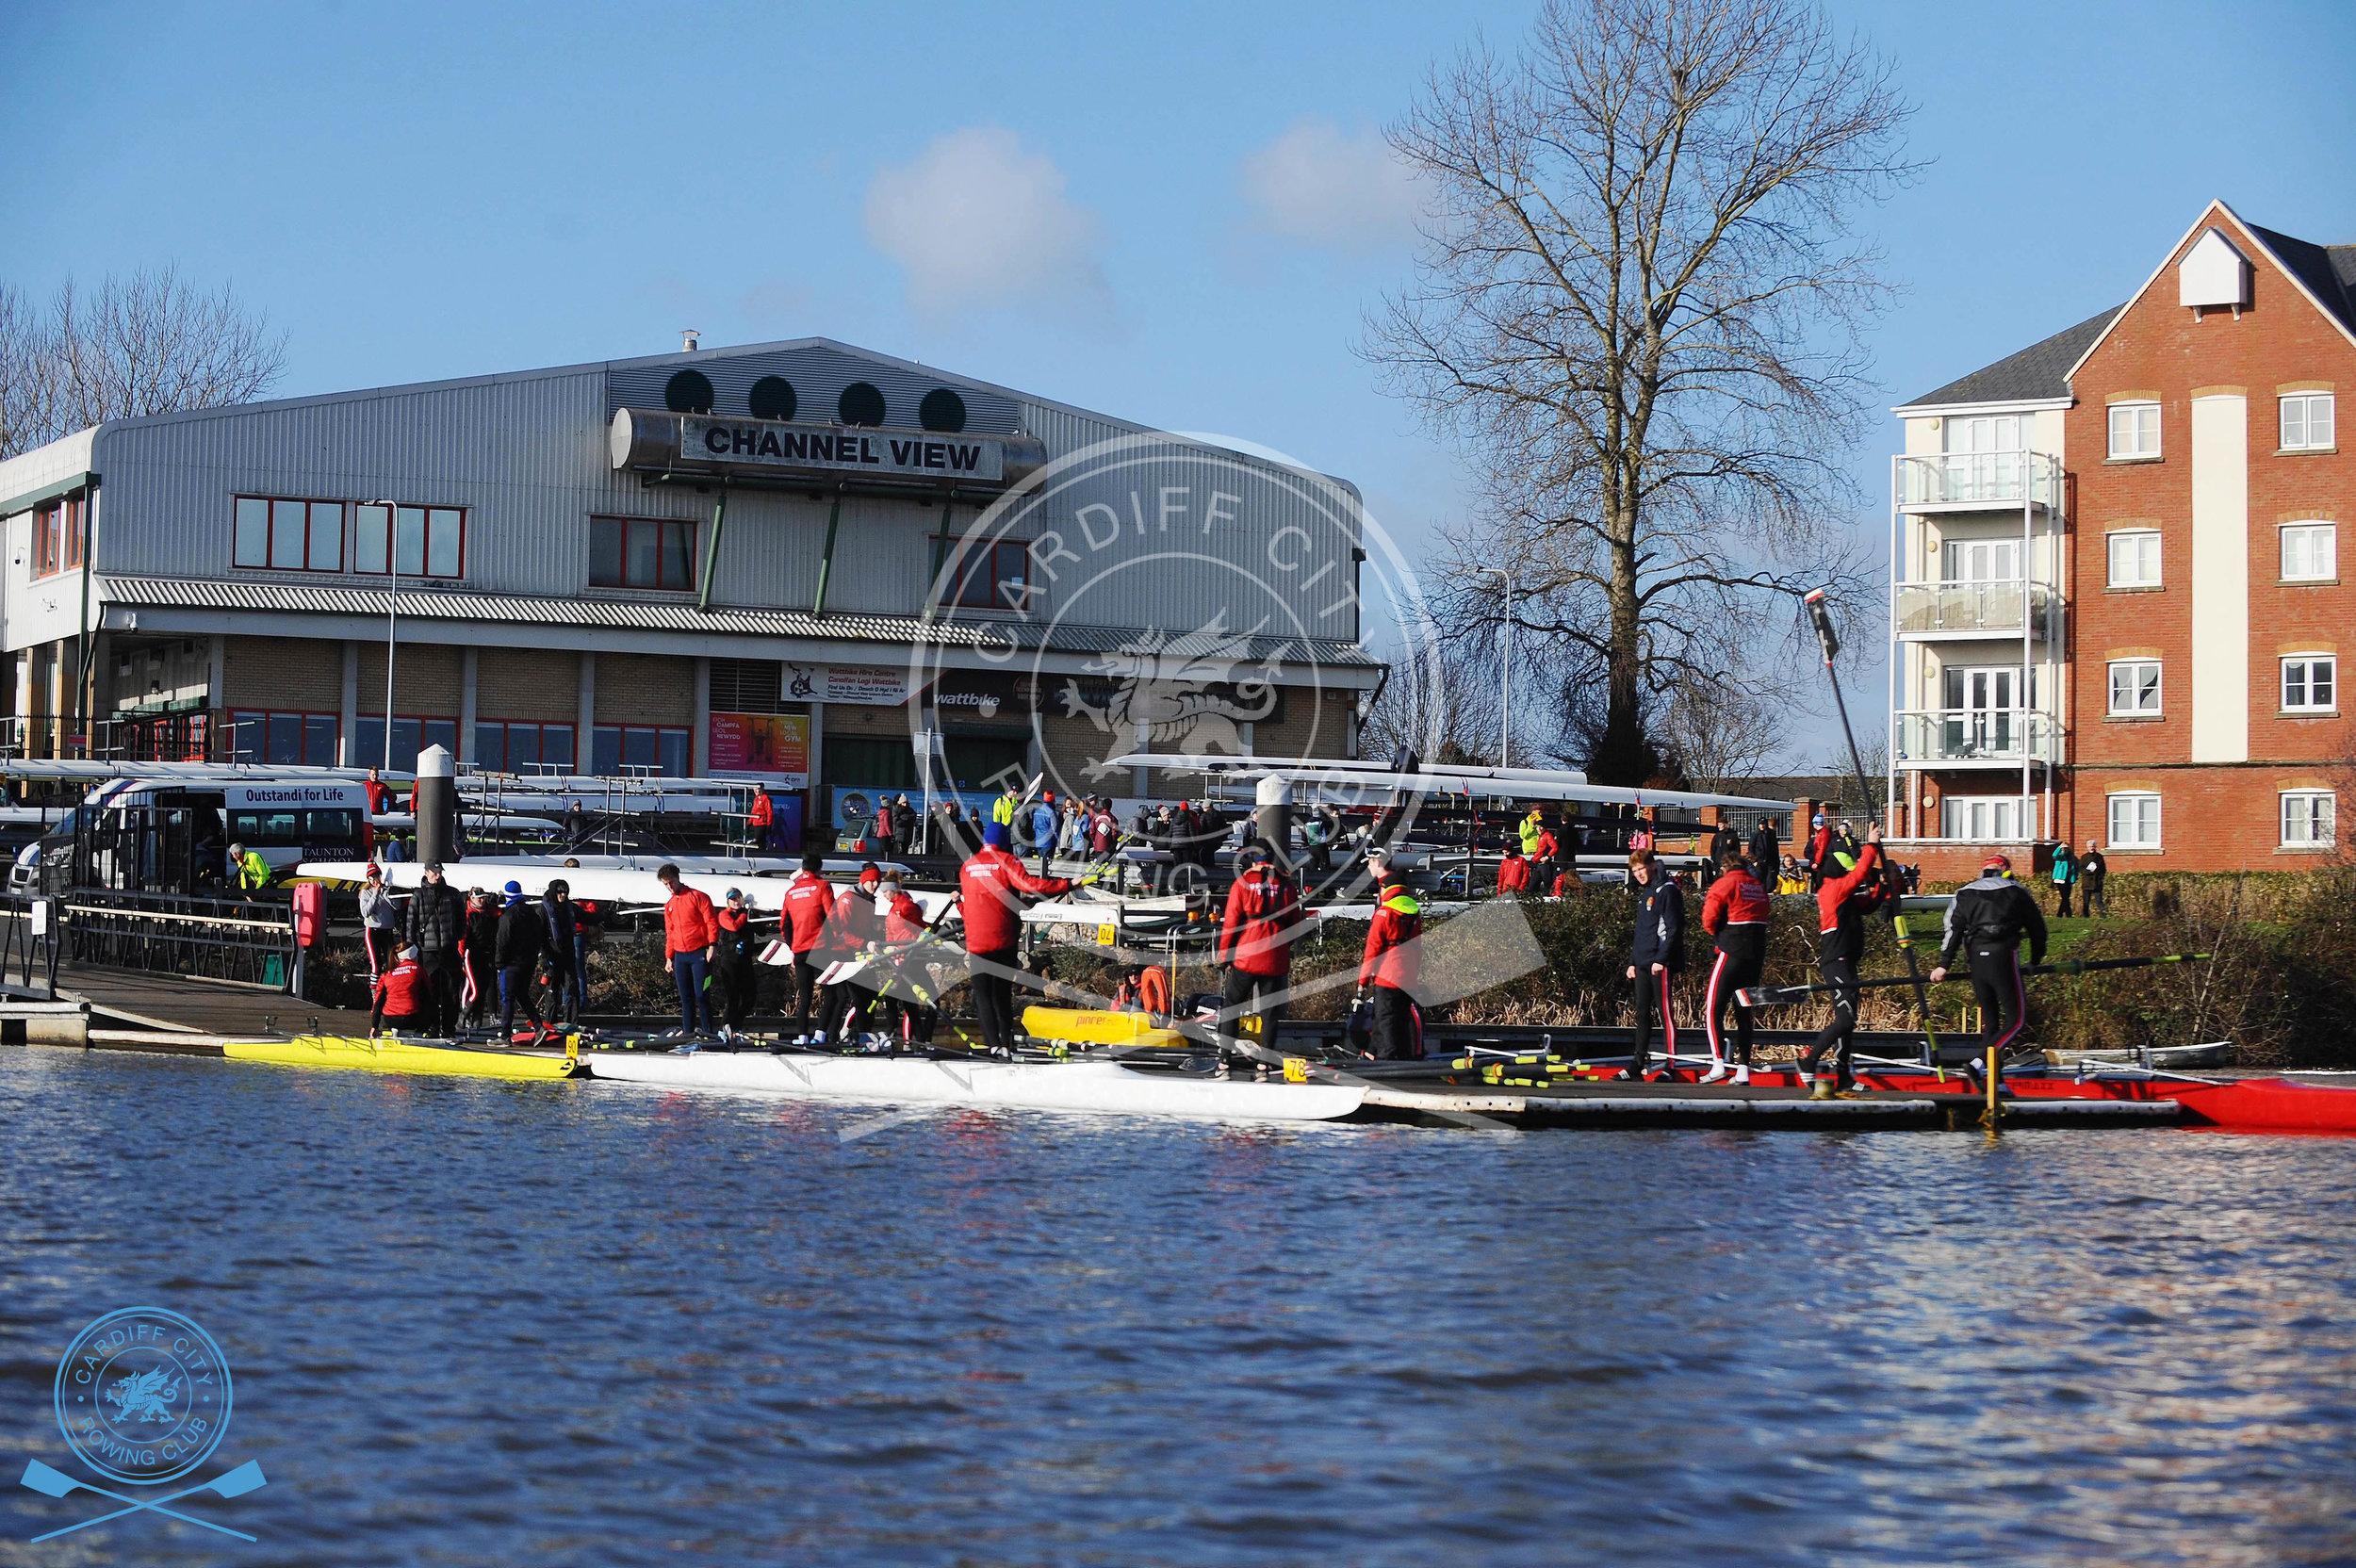 DW_280119_Cardiff_City_Rowing_244.jpg